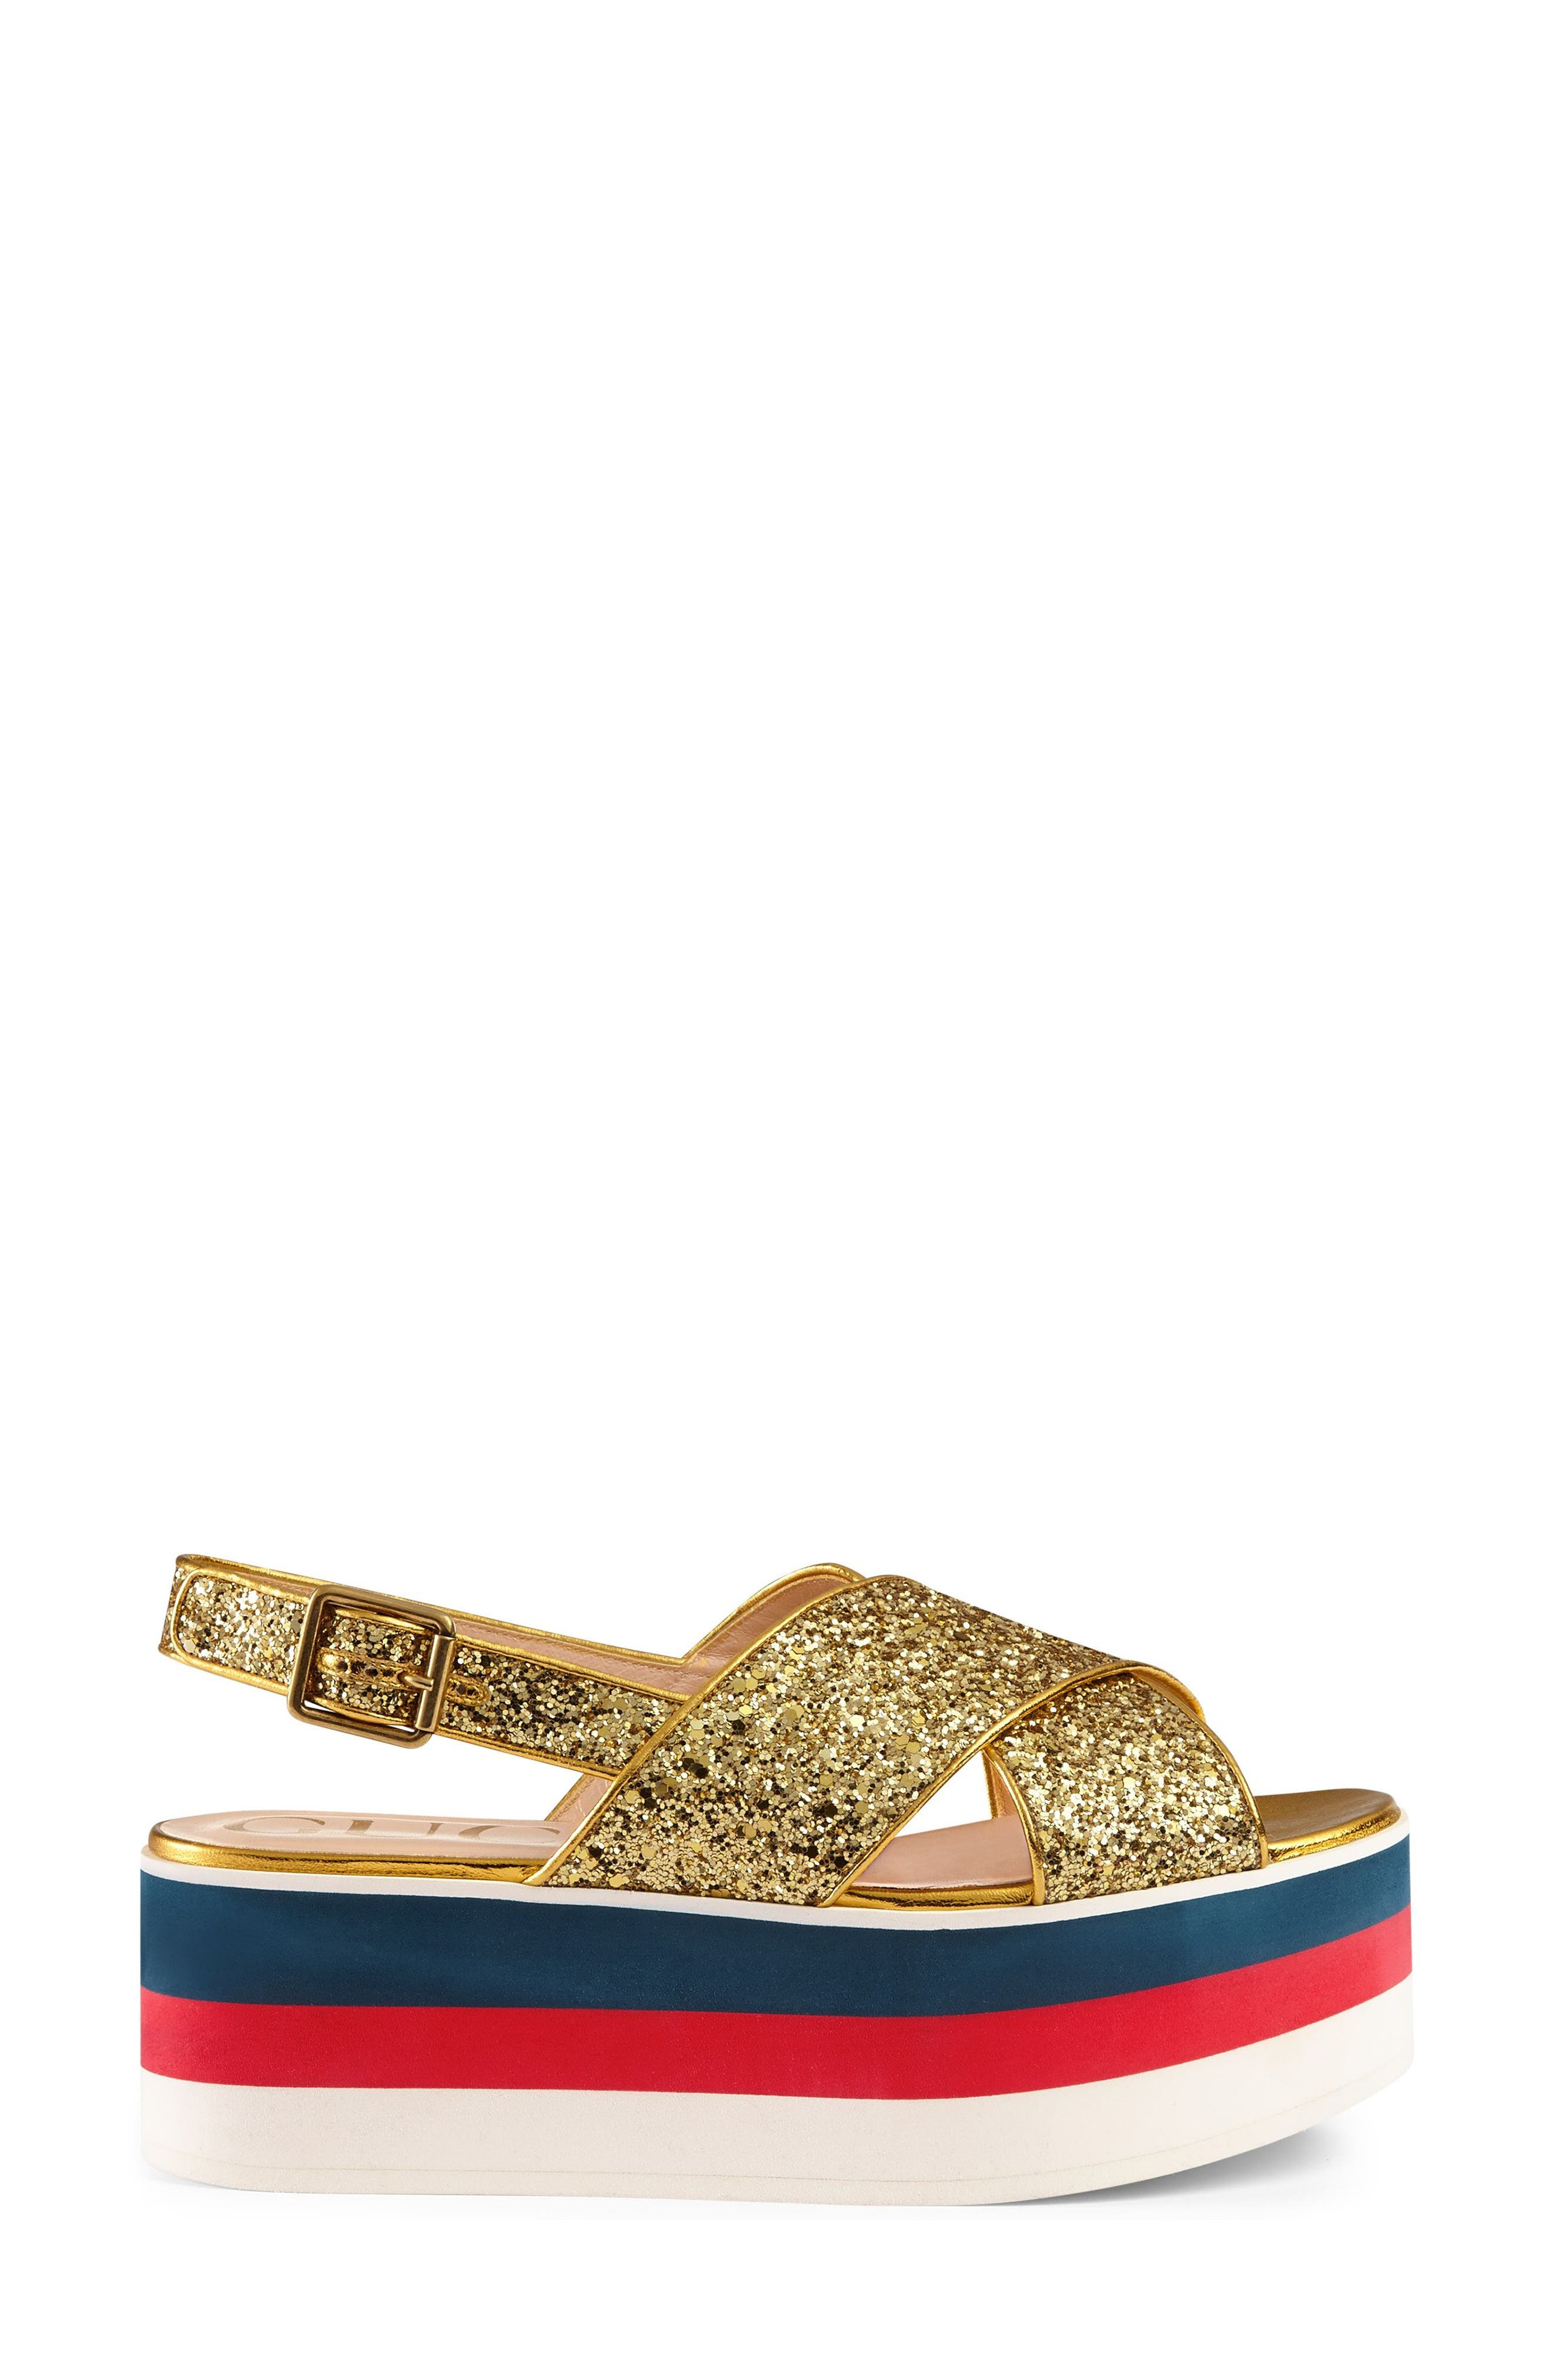 Alternate Image 1 Selected - Gucci Glitter Flatform Sandal (Women)